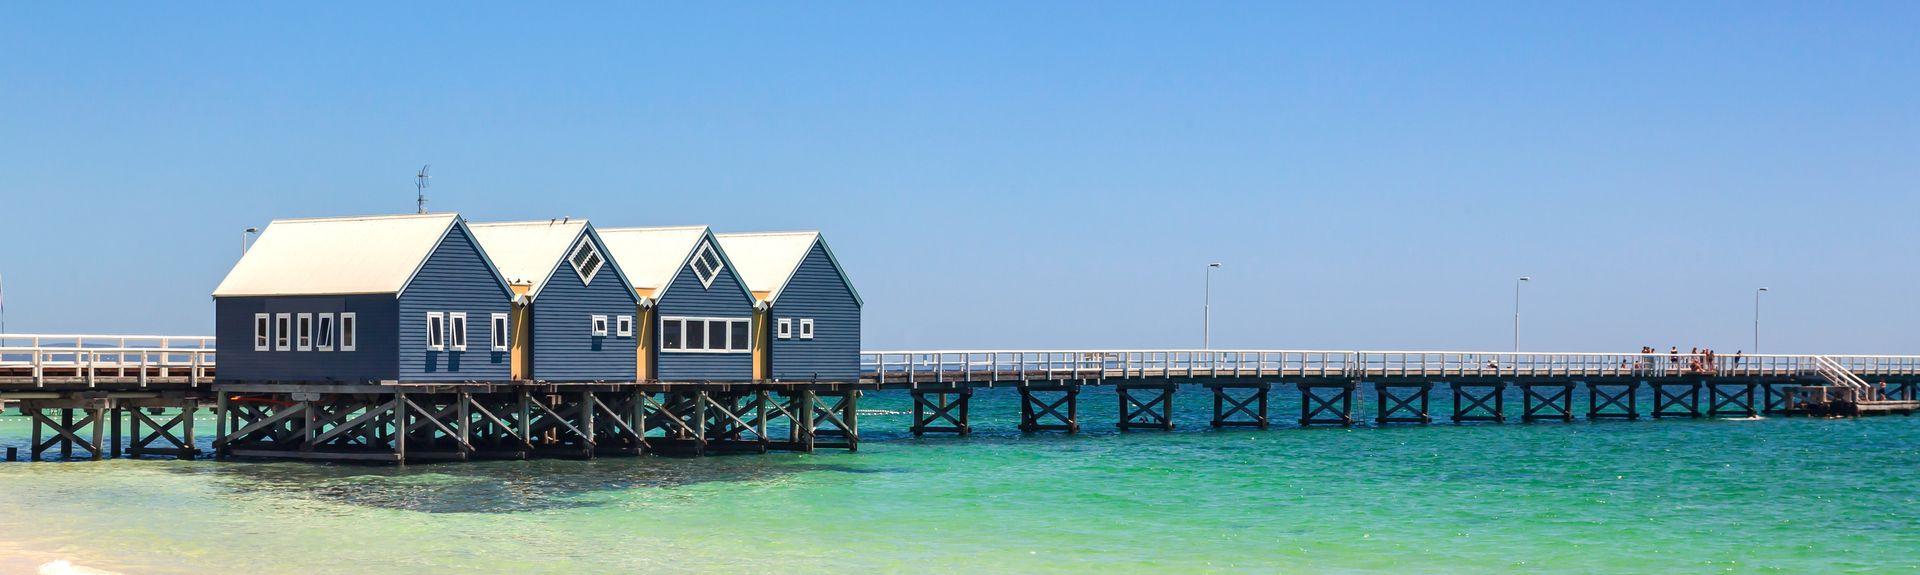 City Of Busselton, Western Australia, Australia